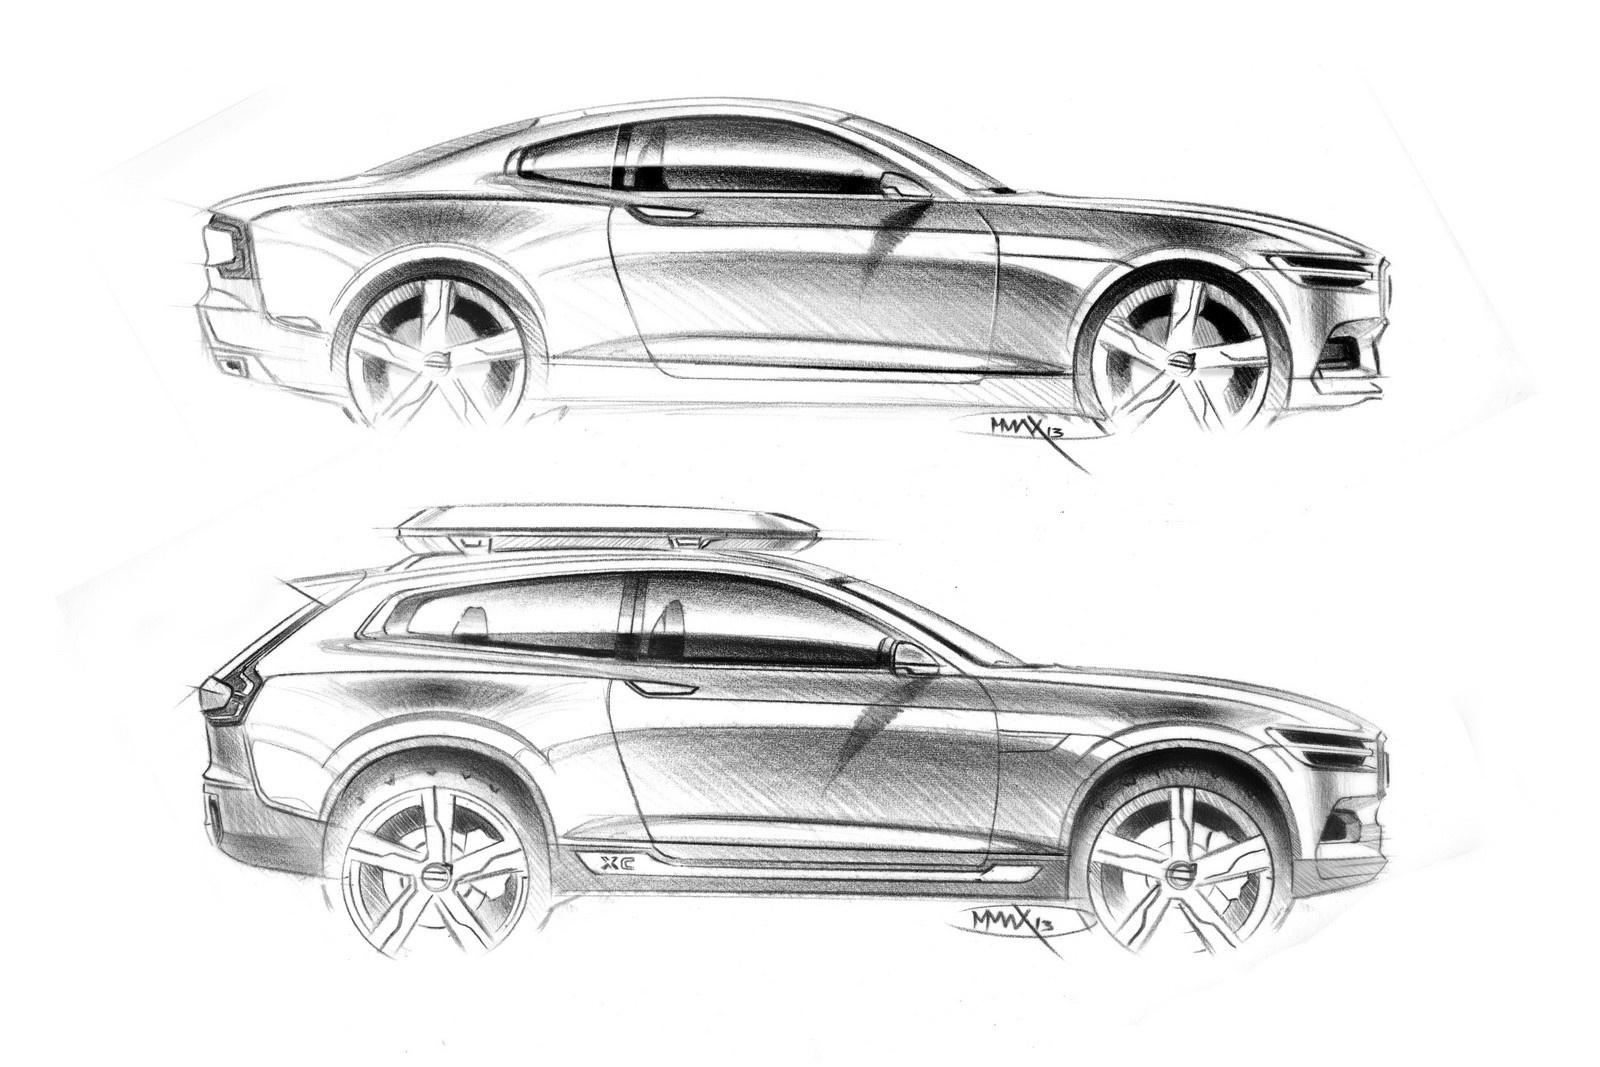 coupe概念车为设计元素,而关于未来全新xc90的推出时间,沃尔沃汽车